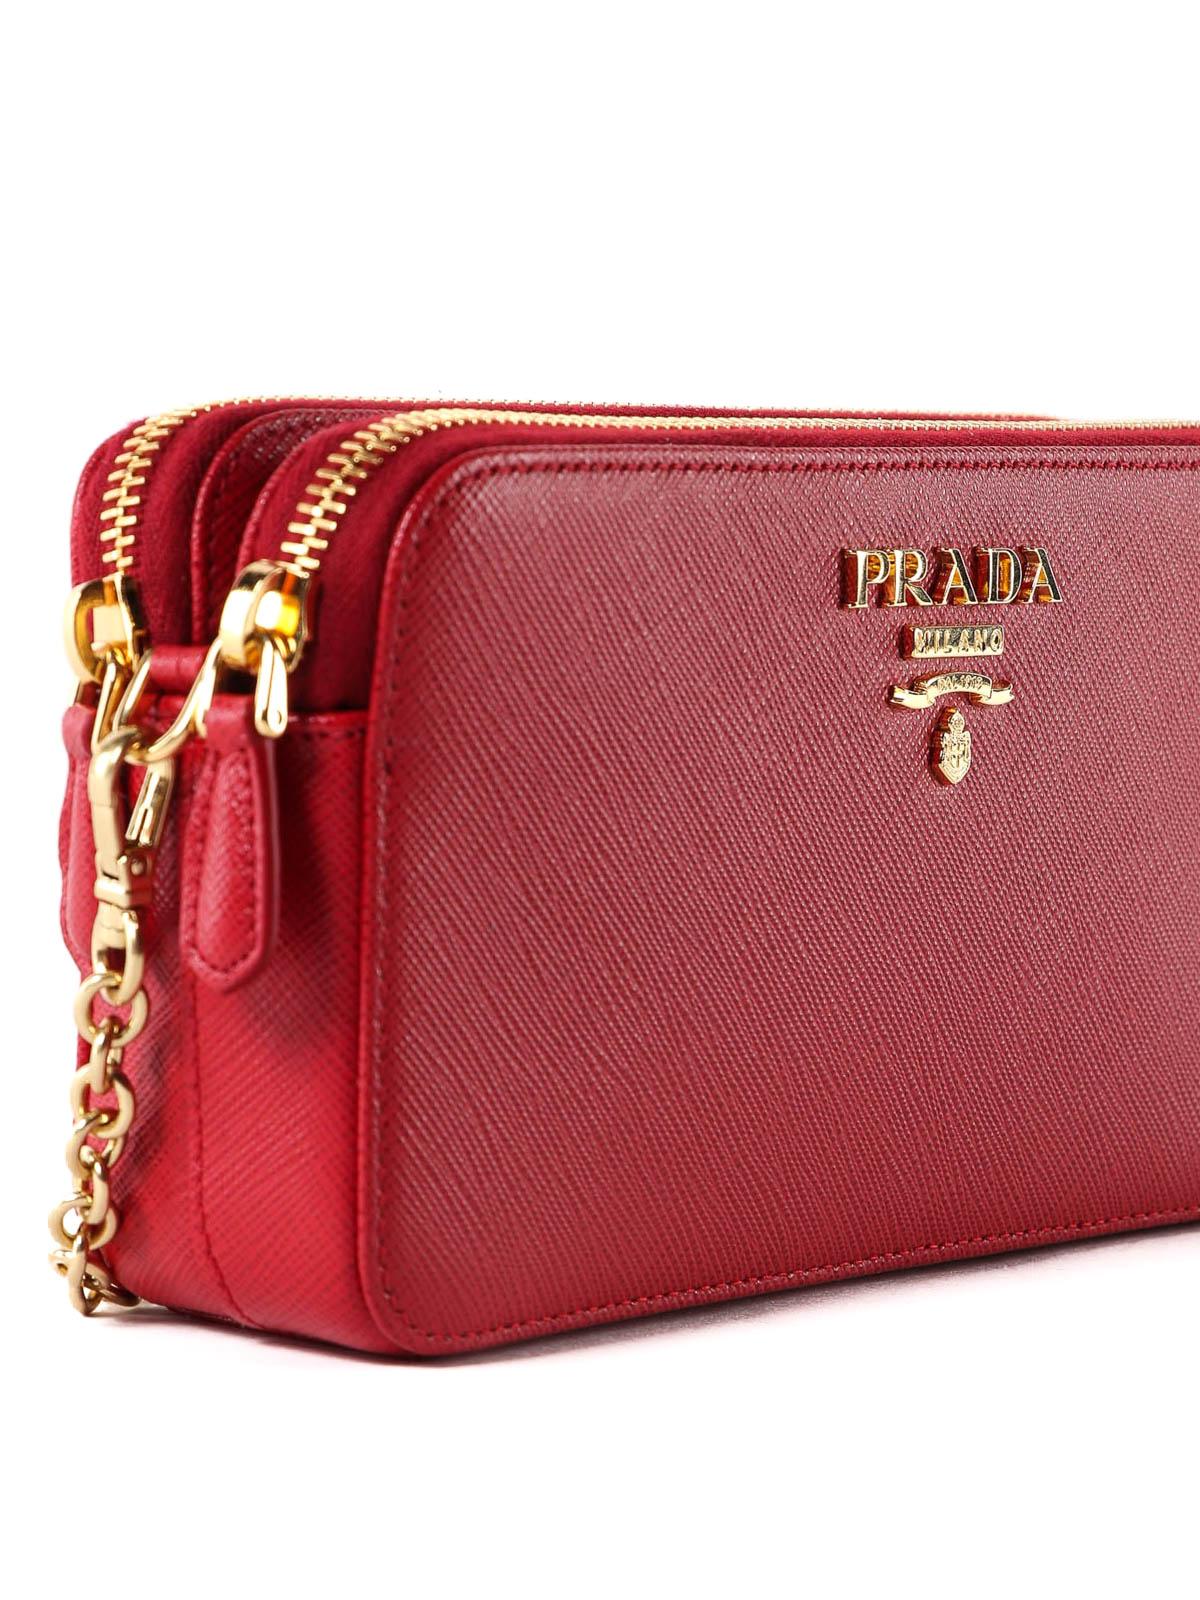 888ba6b0010d11 Prada - Red saffiano camera bag - cross body bags - 1DH010QWA 68Z